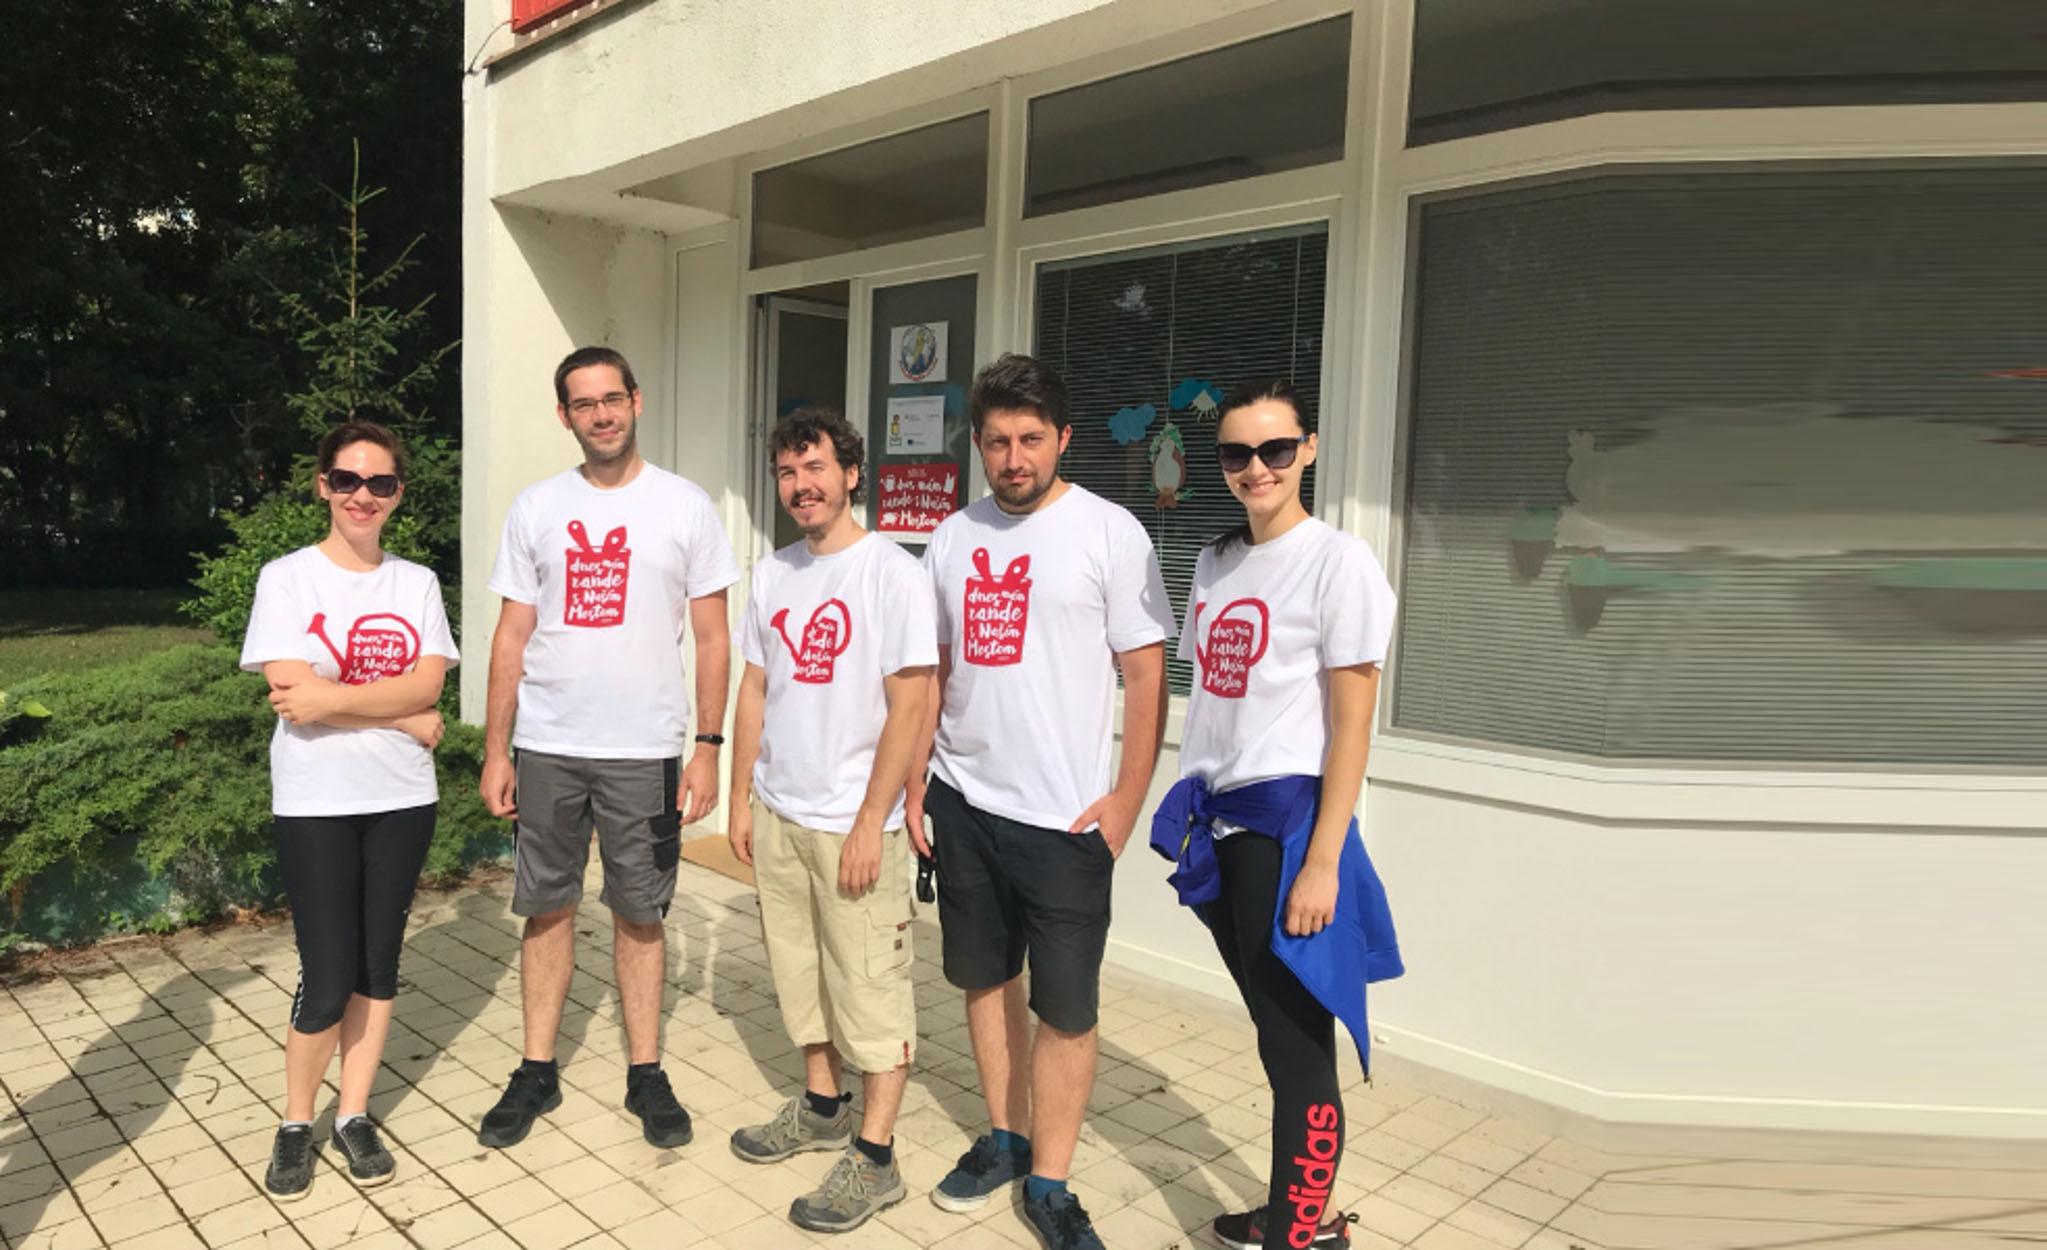 ERNI Slovakia Team - Volunteering for our city